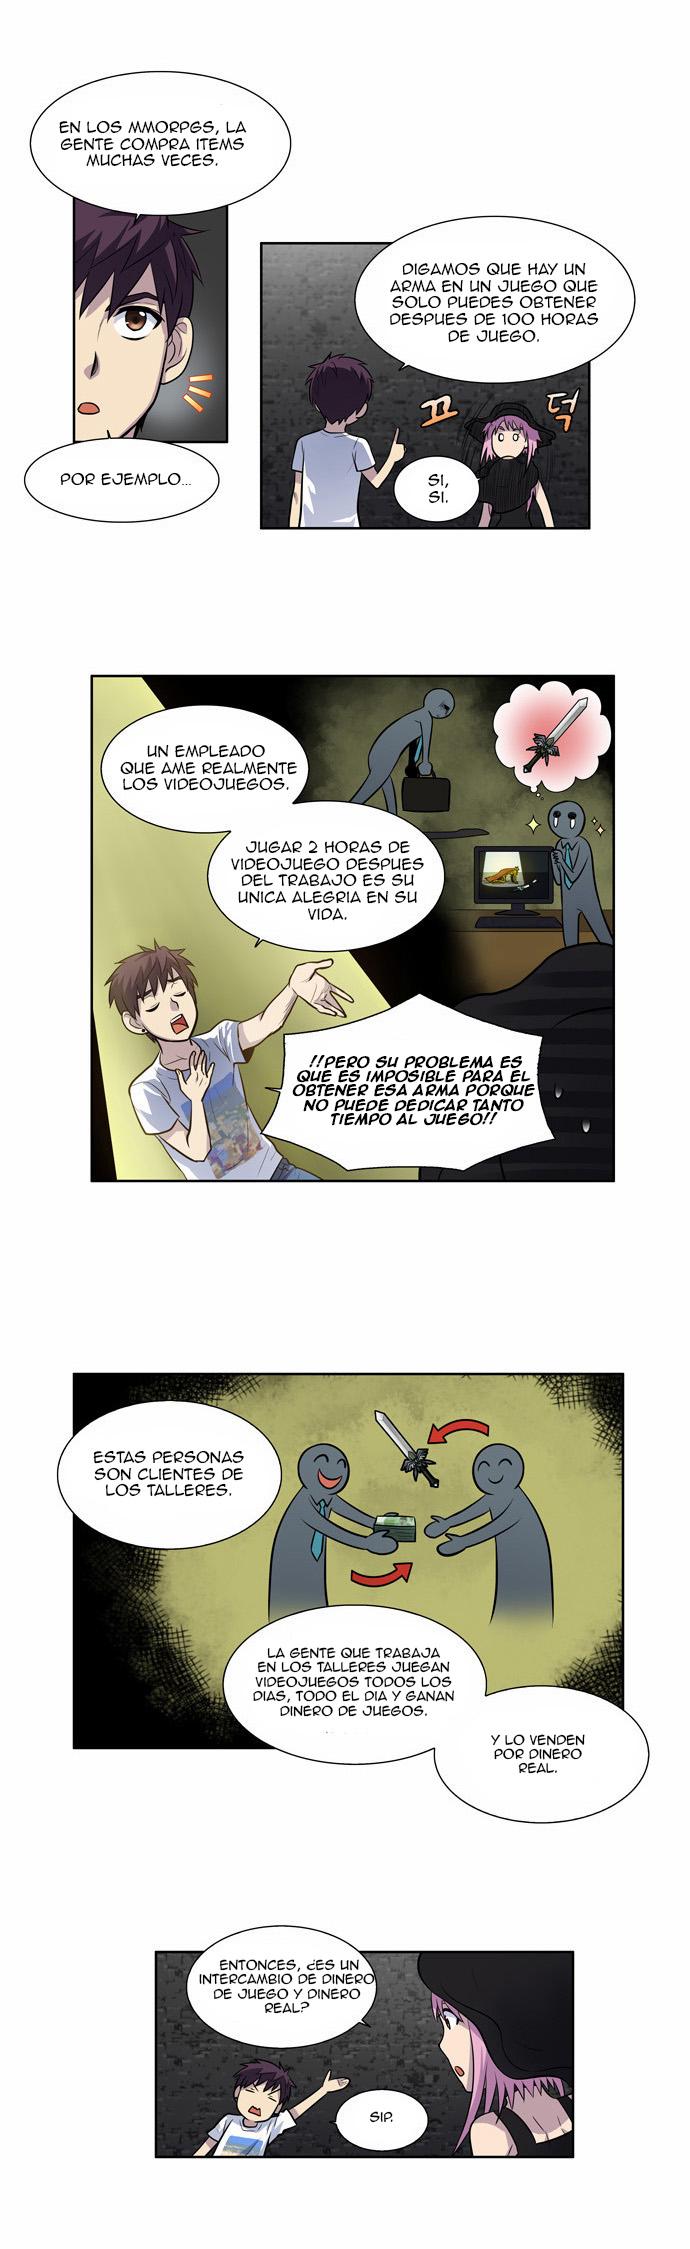 http://c5.ninemanga.com/es_manga/61/1725/416522/3af93ca5a2f992ef459b5fb6da4d3668.jpg Page 16